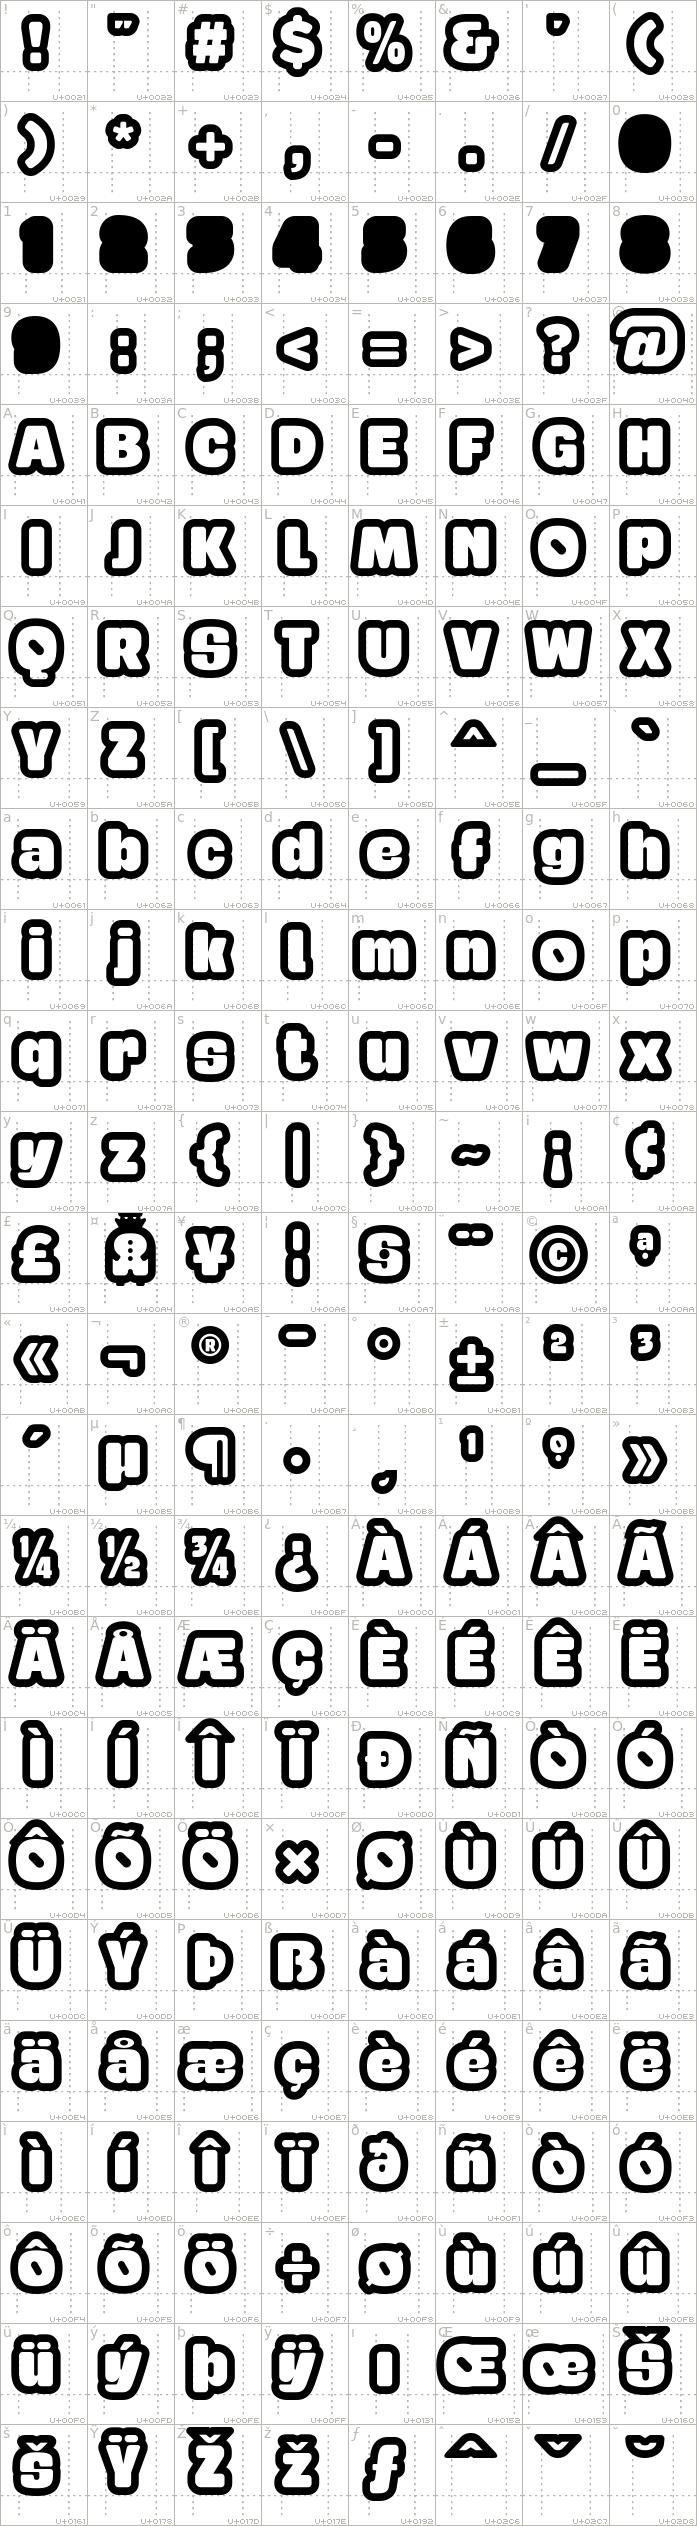 gaban.regular.character-map-1